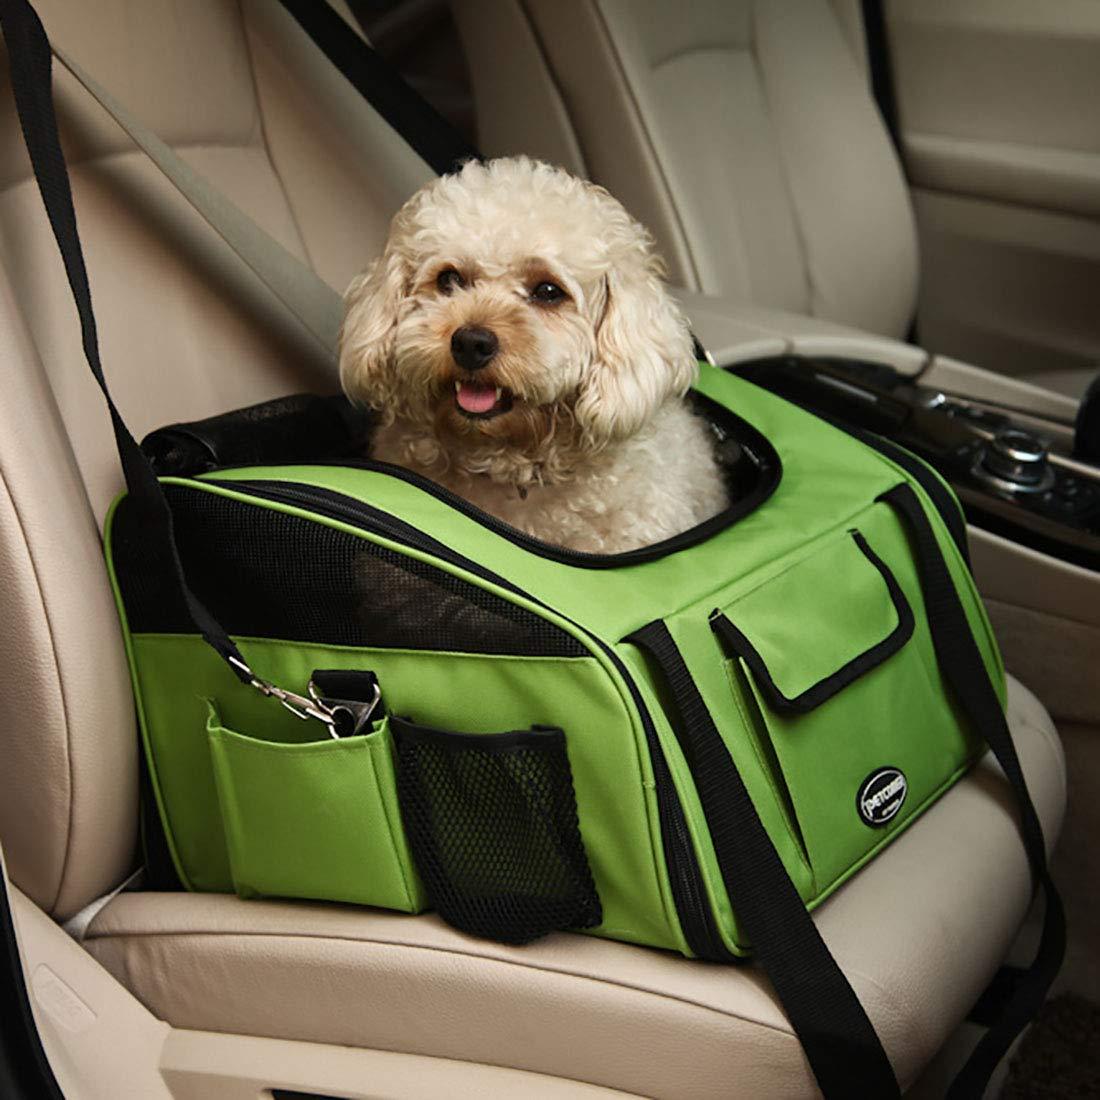 Green 40X34X26cm Green 40X34X26cm CEFUTY Pet Car Bag Kennel Car Bag Pet Bag Pet Dog Backpack Car Mat (Colore: Verde, Dimensione: 40X34X26cm)